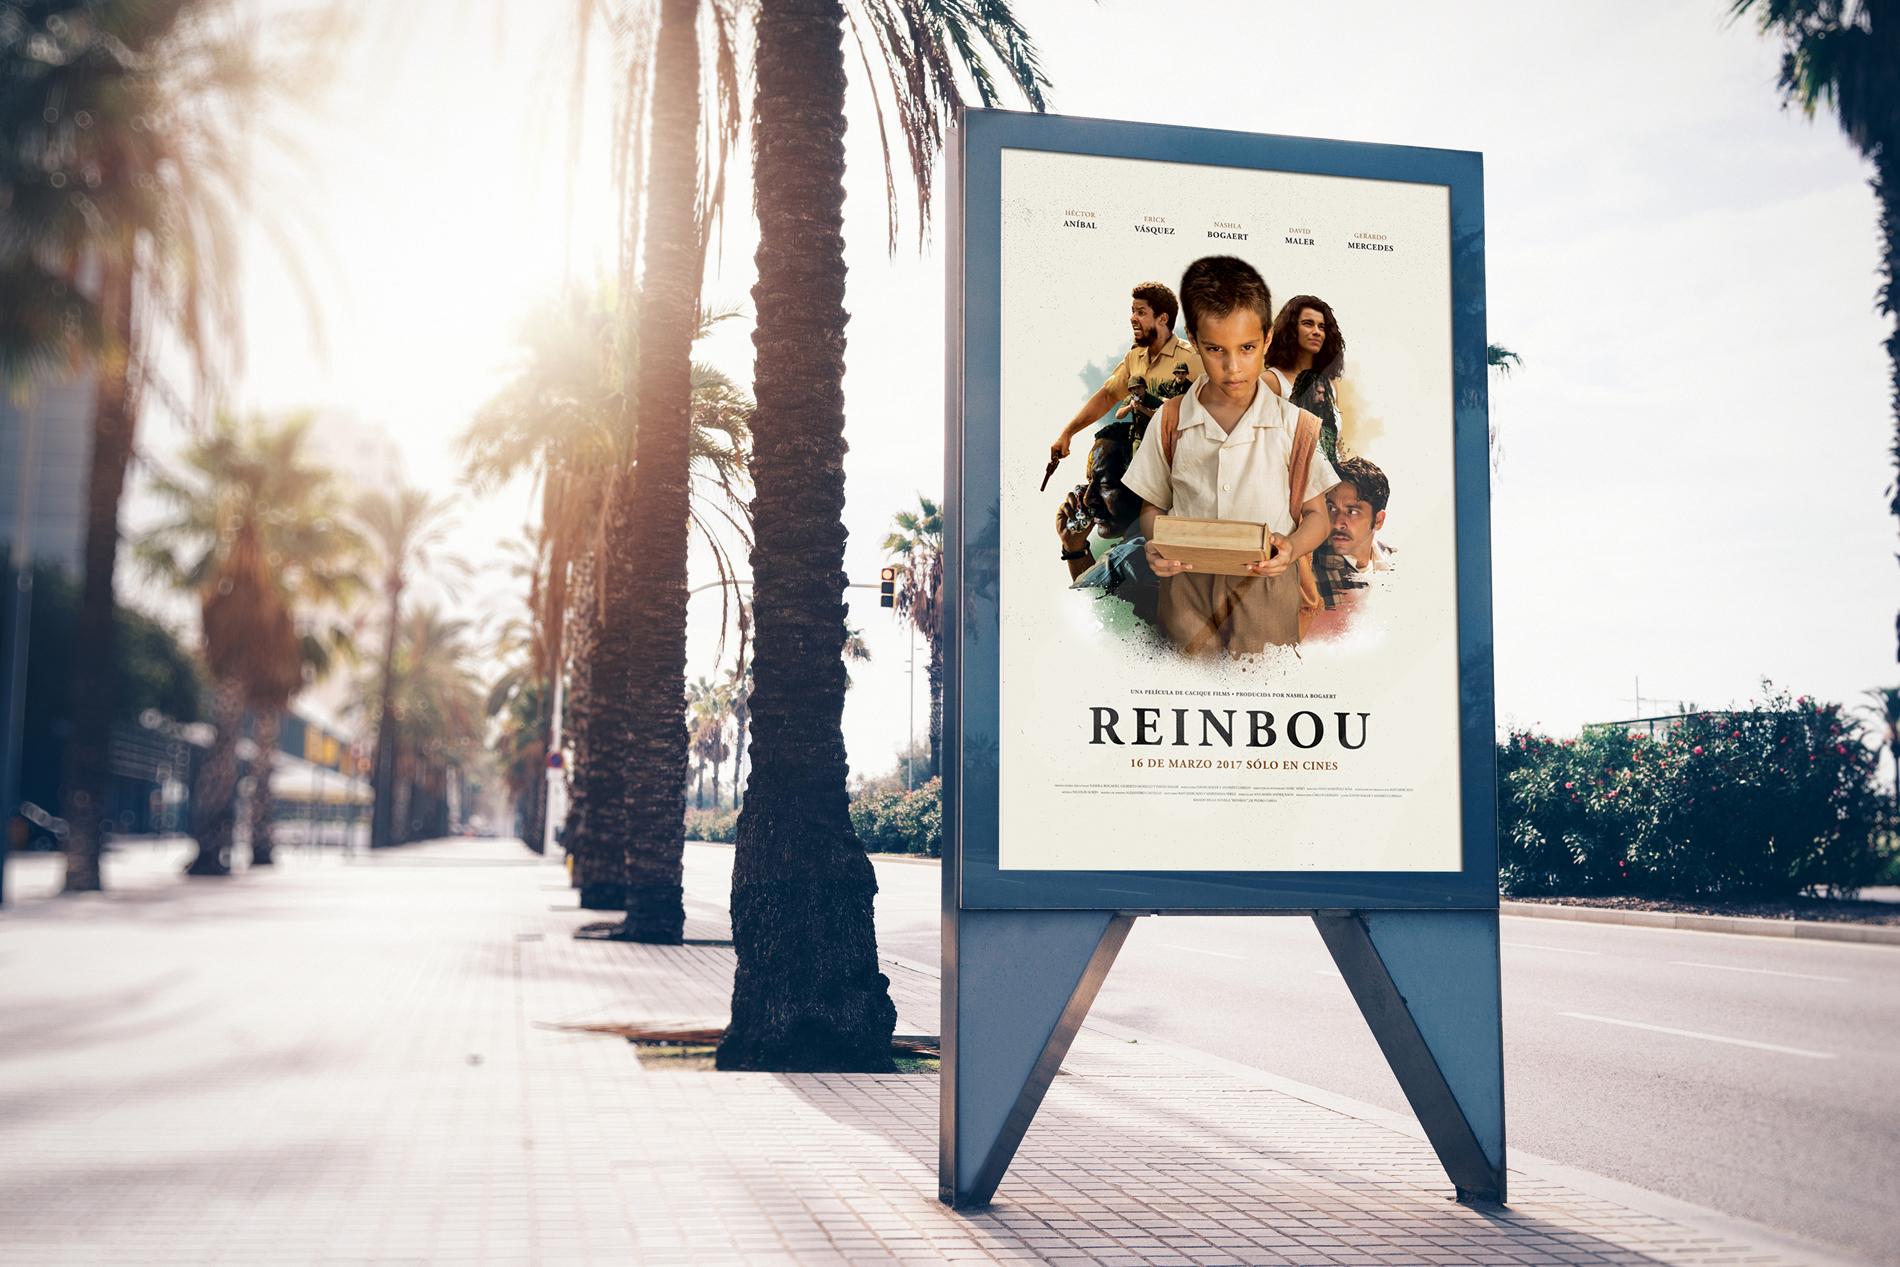 Reinbou_Project11_Reinbou.jpg